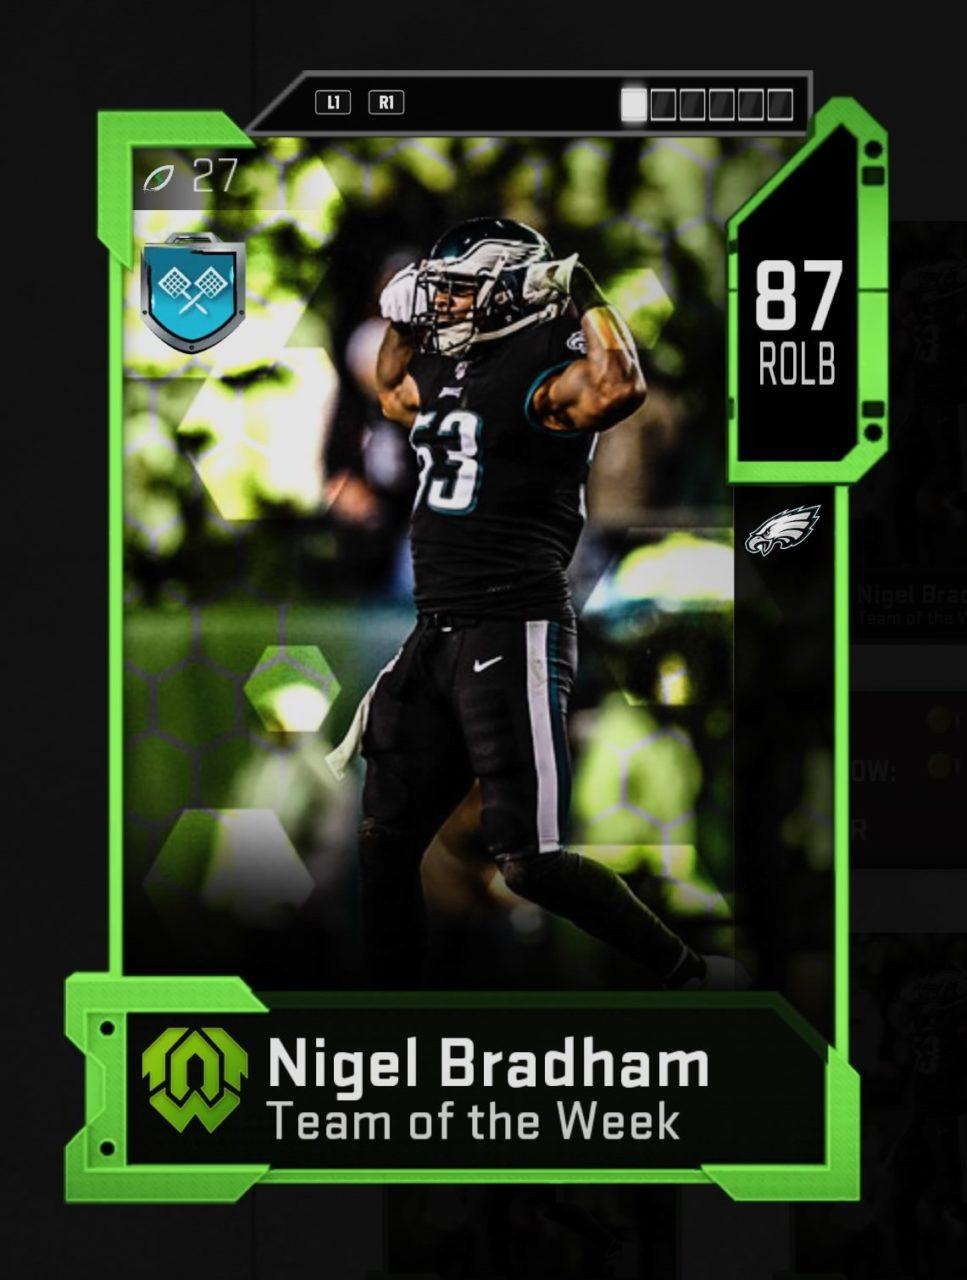 madden_20_team_of_week_15_nigel_bradham